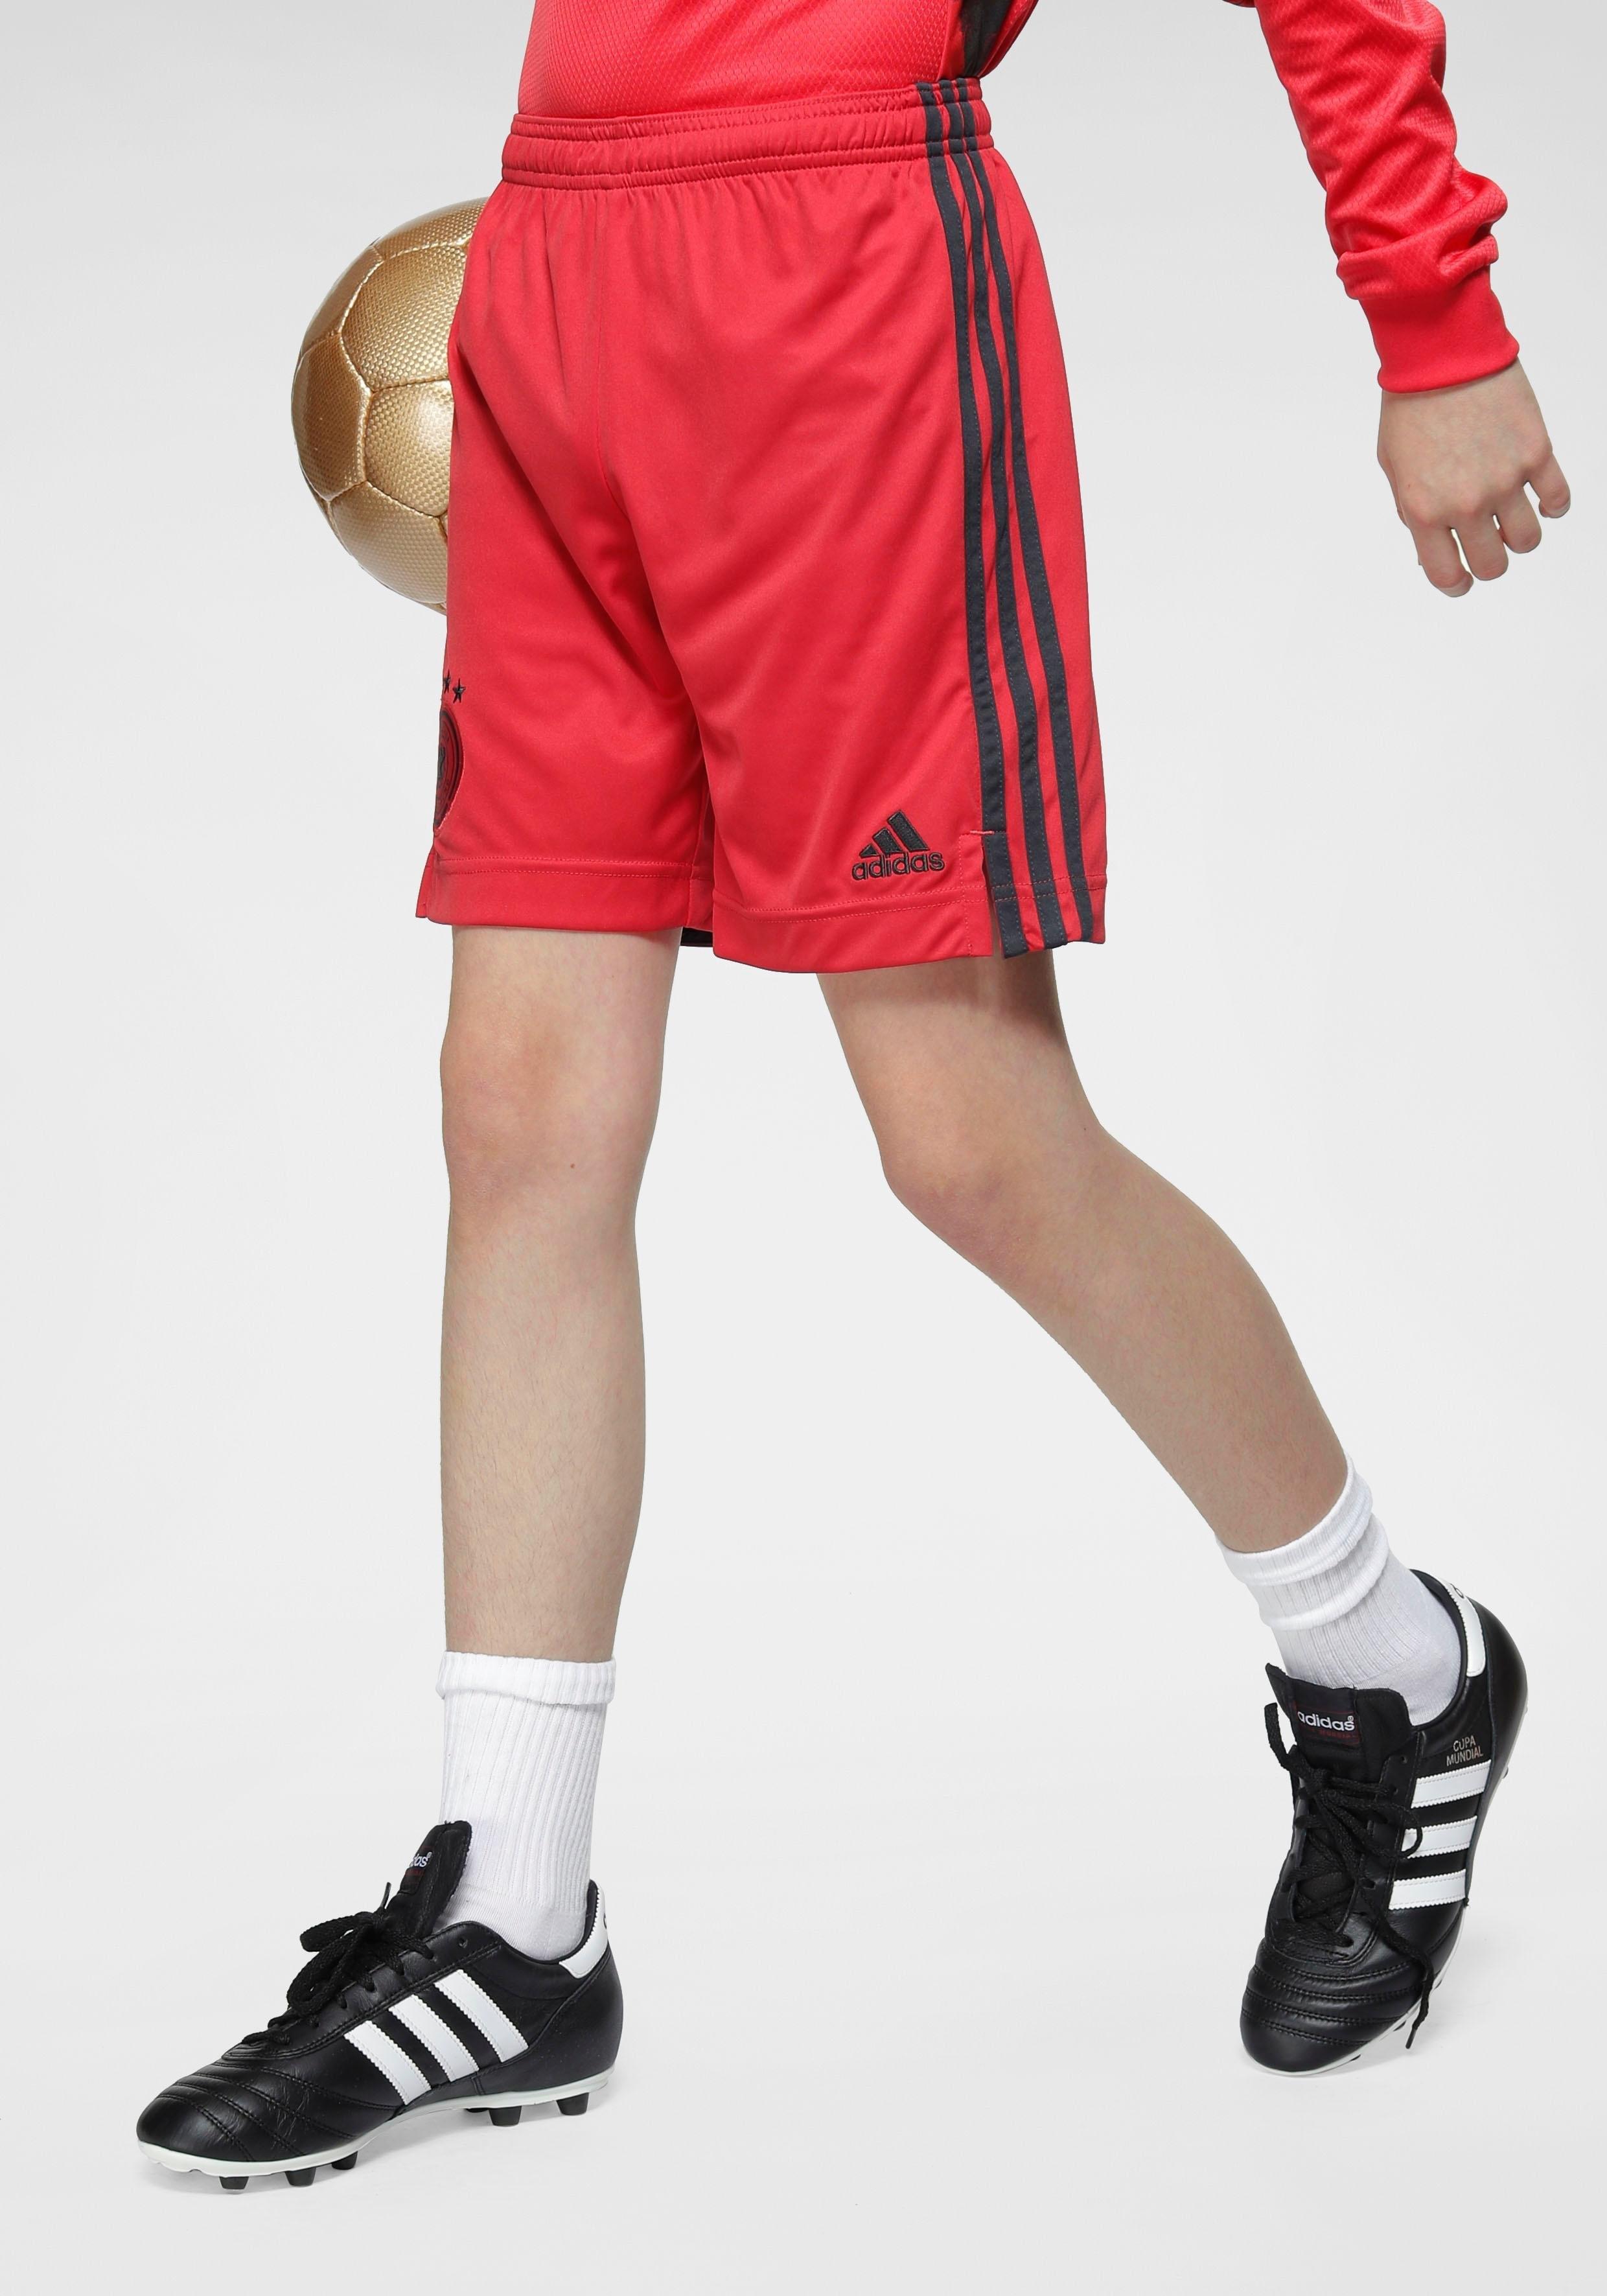 adidas Performance trainingsshort EM 2021 DFB doelman-thuisbroek kinderen bij OTTO online kopen